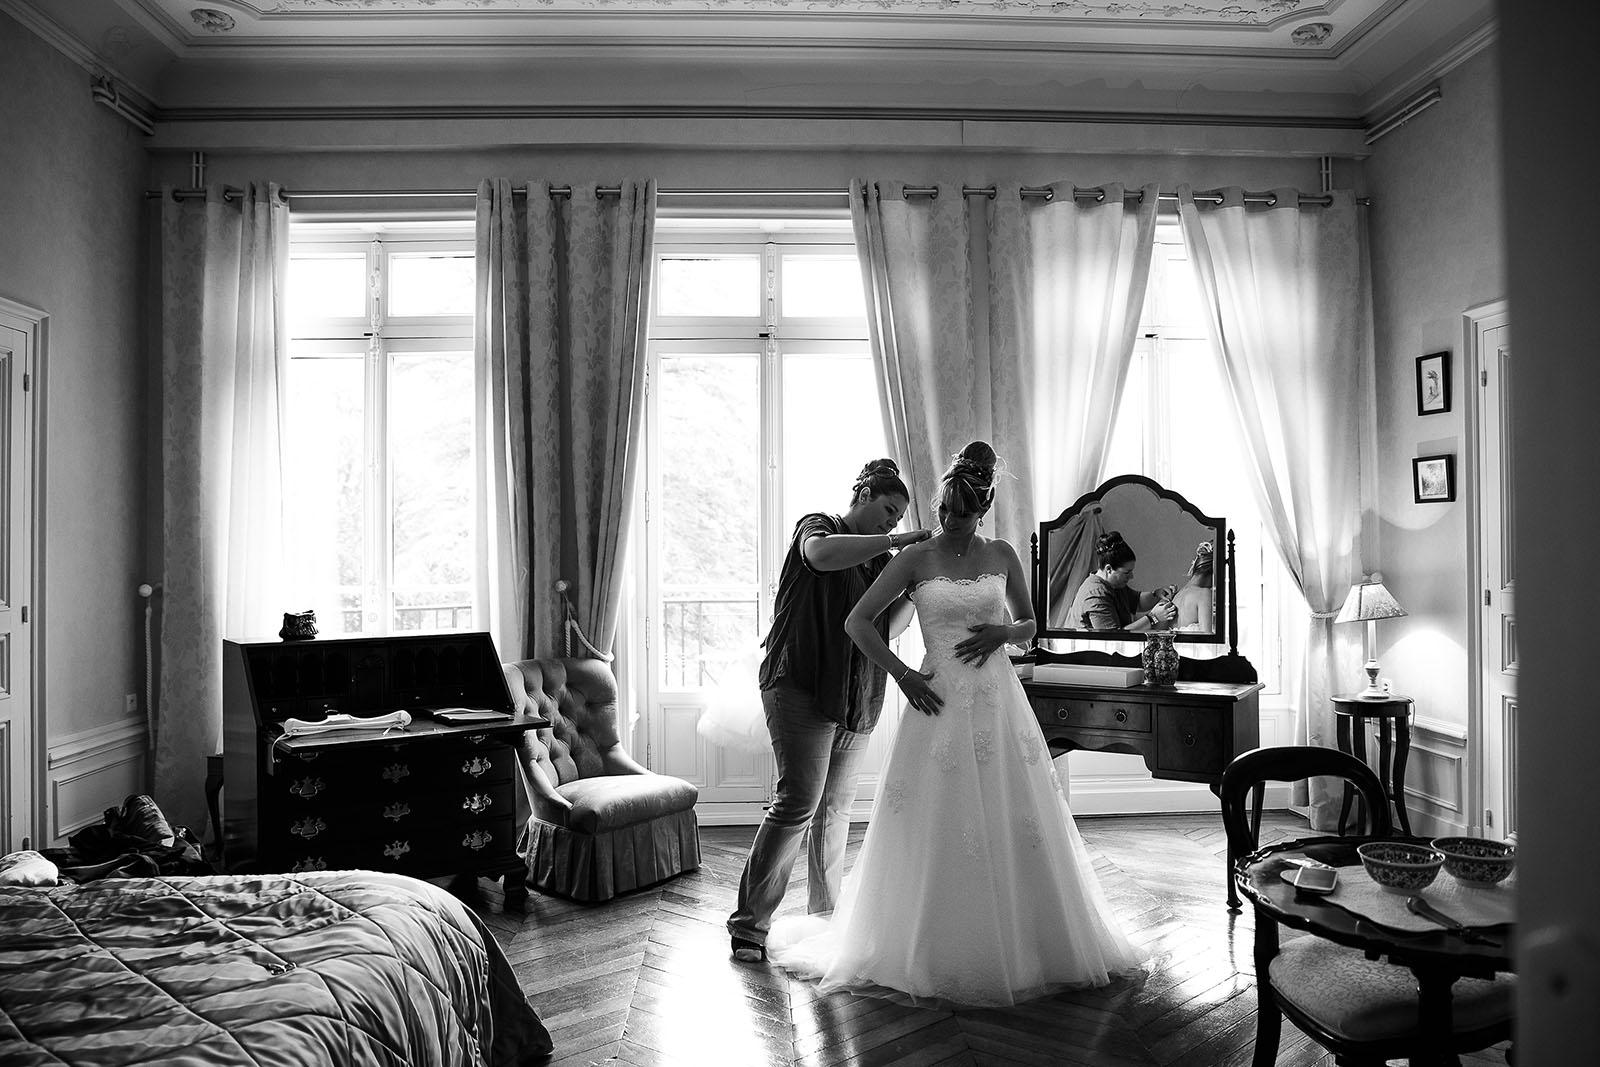 photographe de mariage chalon sur sane la marie enfile sa robe photo ralise - Photographe Mariage Chalon Sur Saone